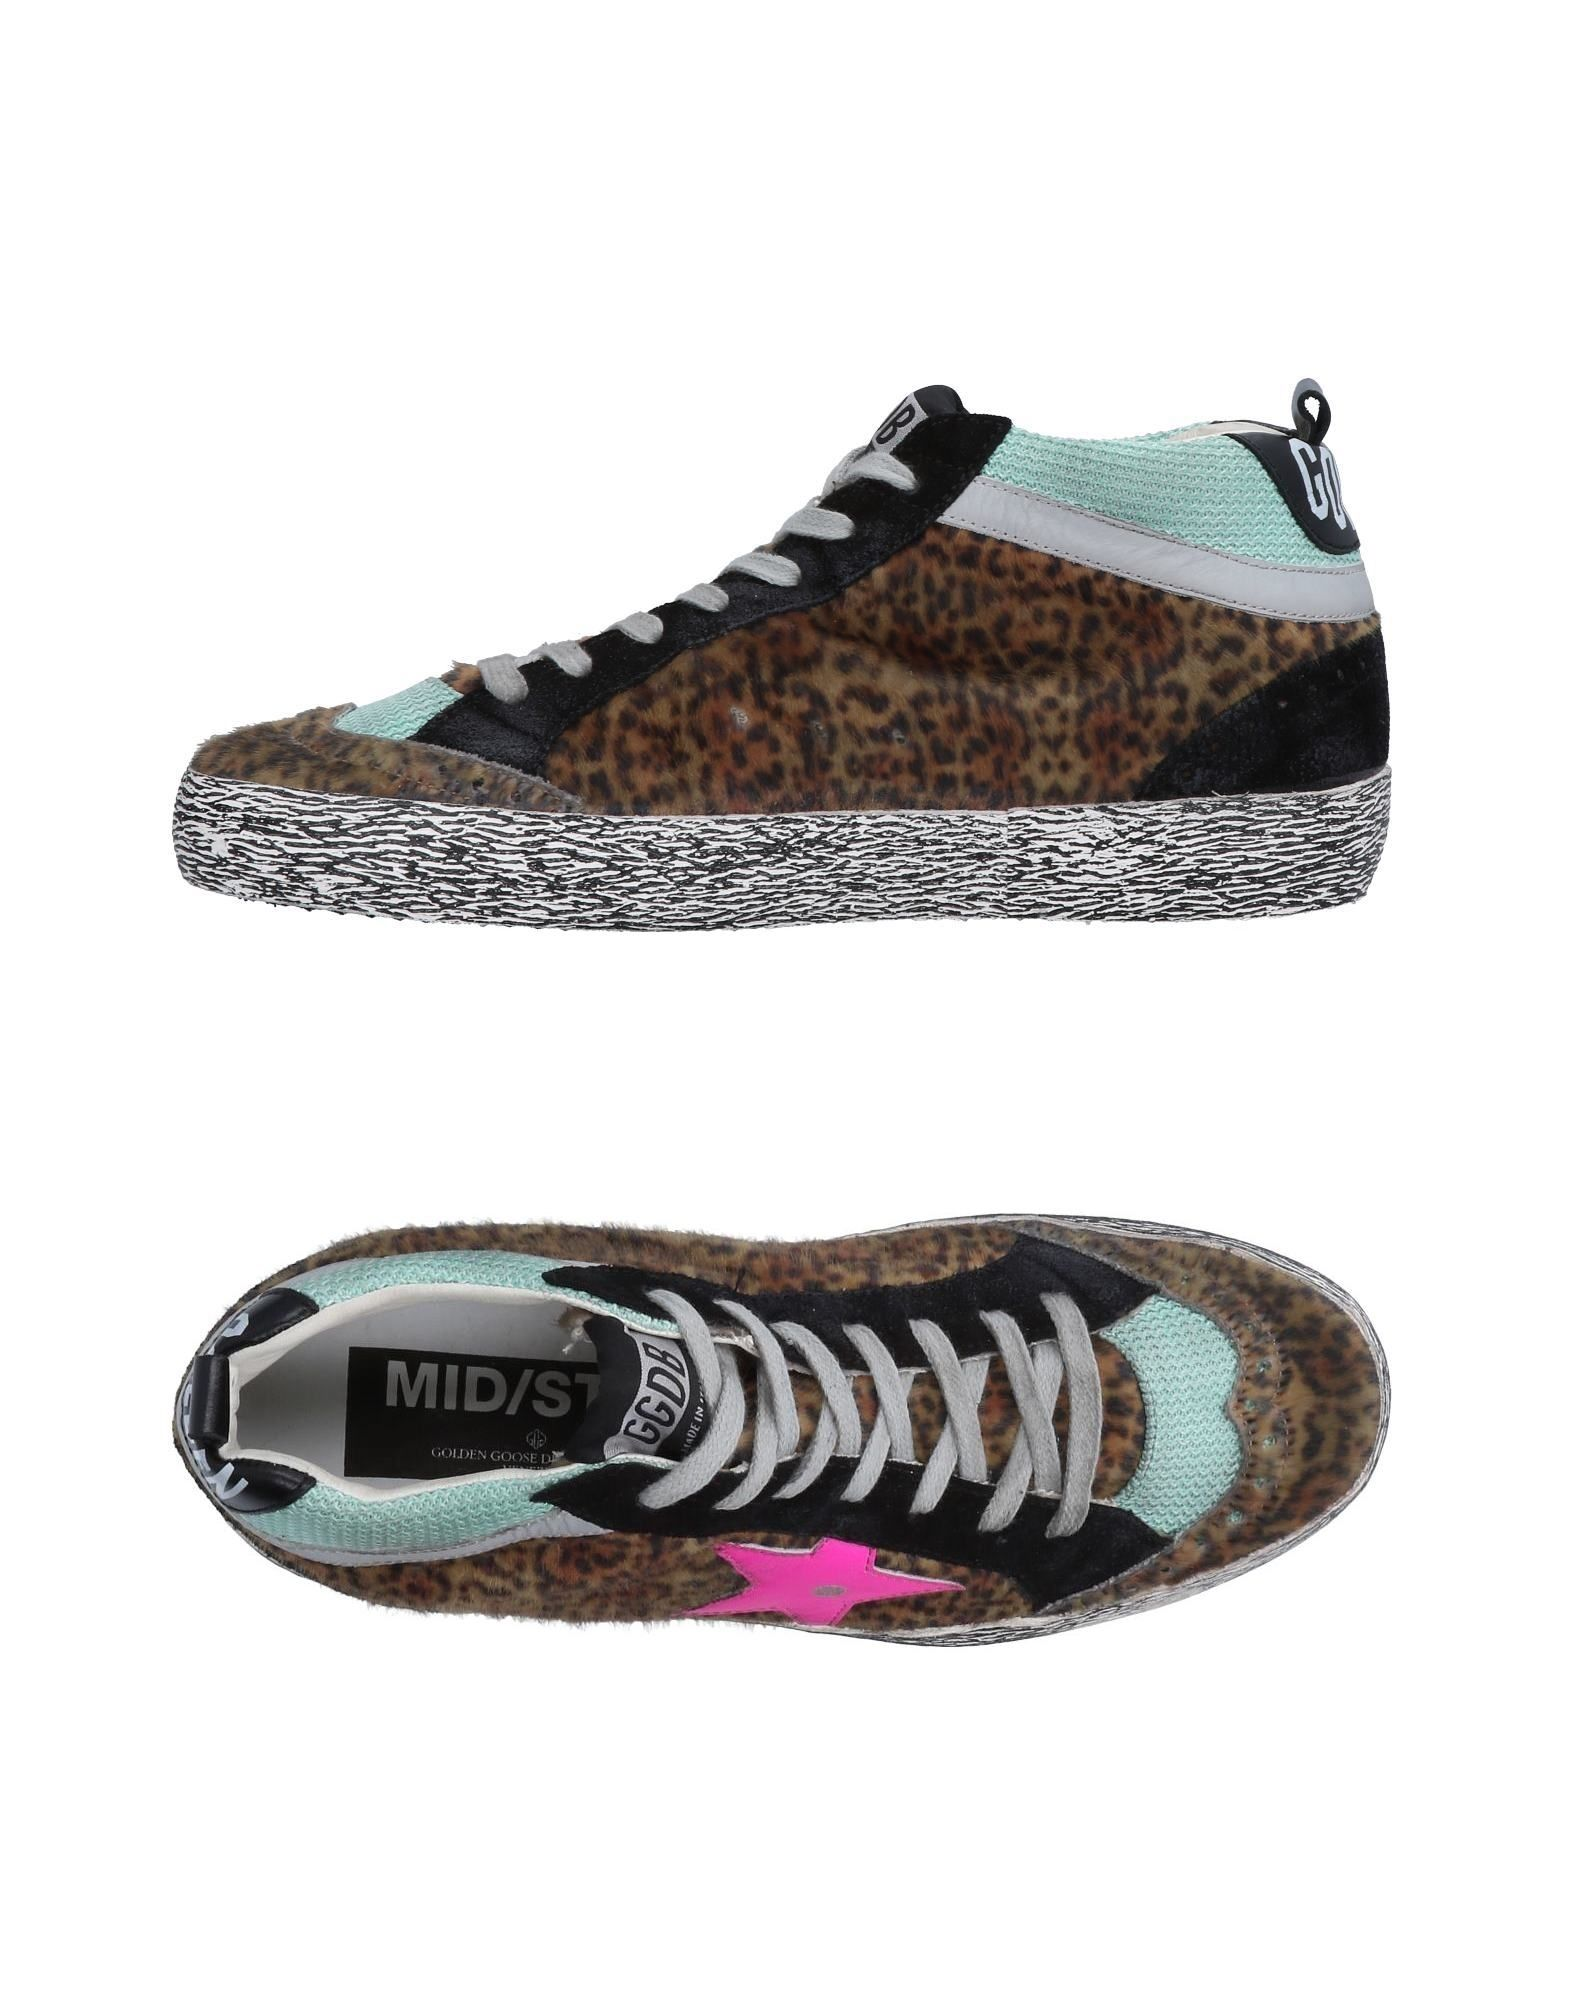 Sneakers Golden Goose Deluxe Brand 11506811TN Donna - 11506811TN Brand 468dd7